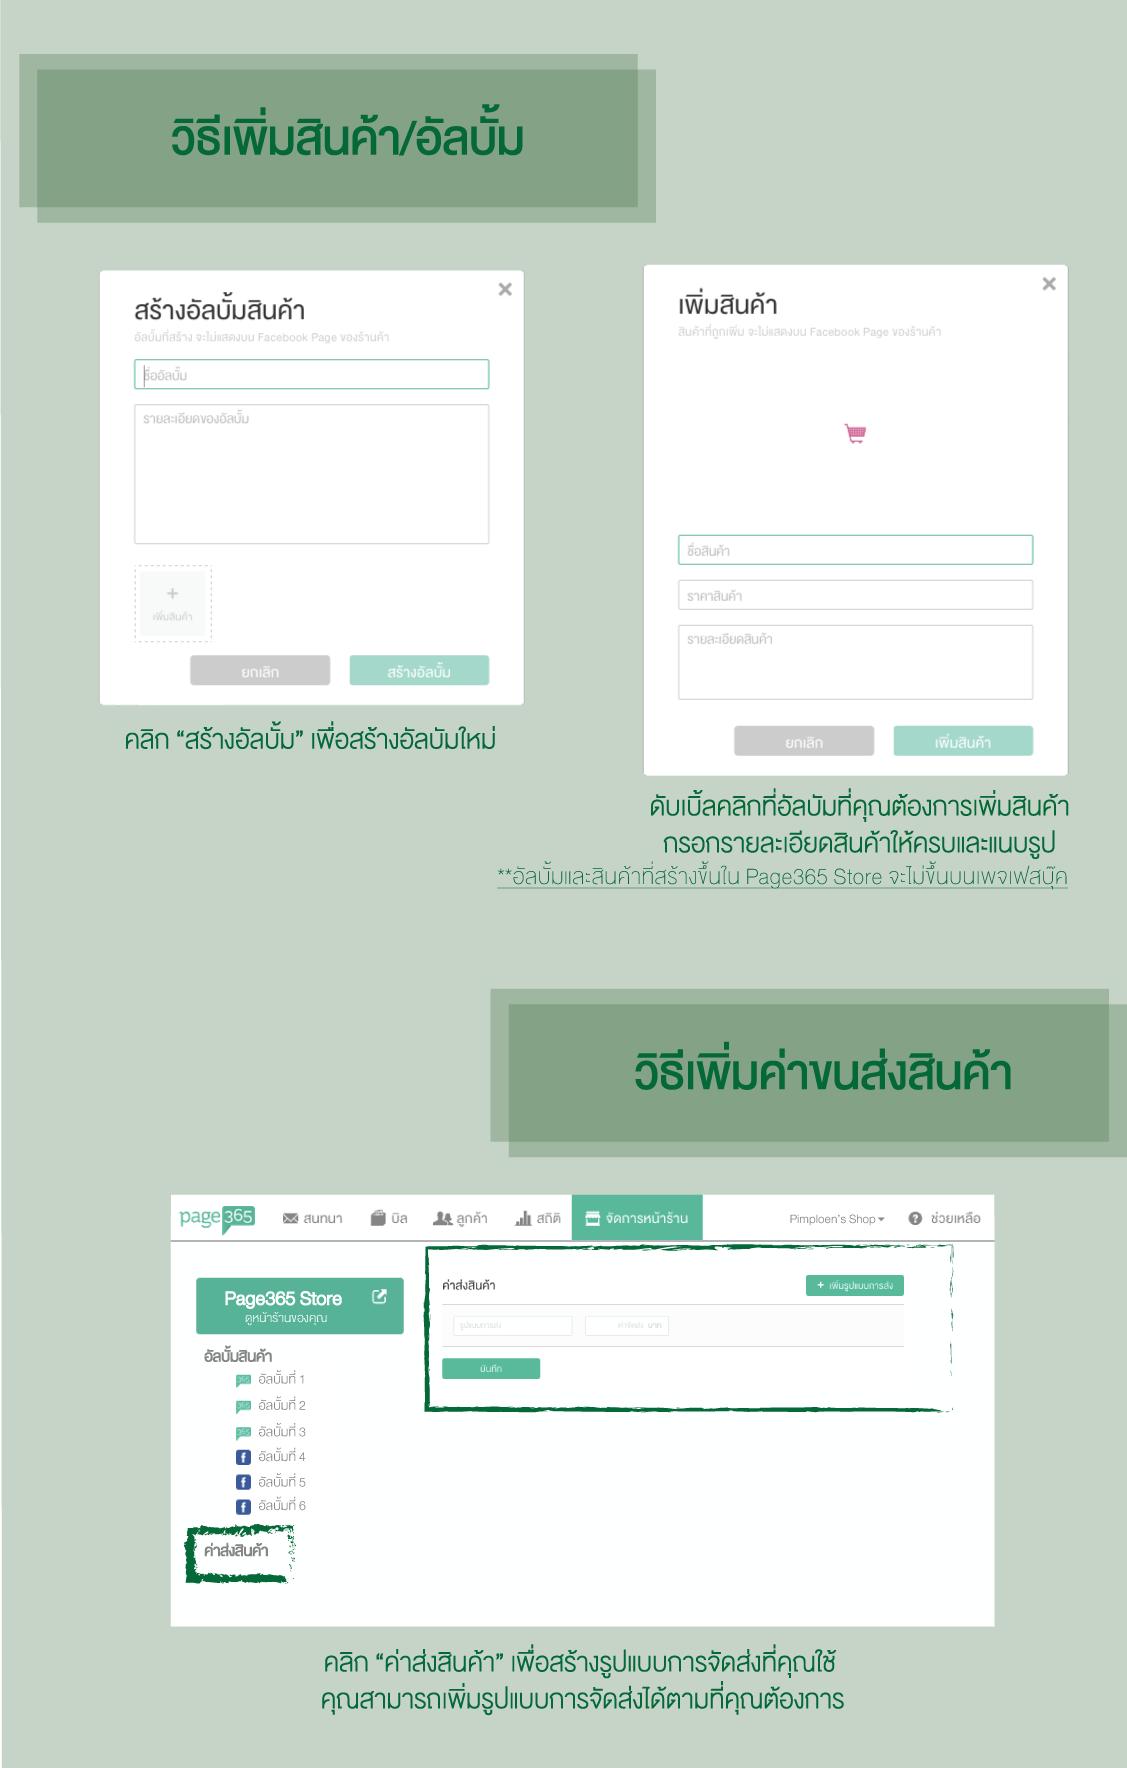 Page365-Store-เพิ่มสินค้าและค่าขนส่ง.png